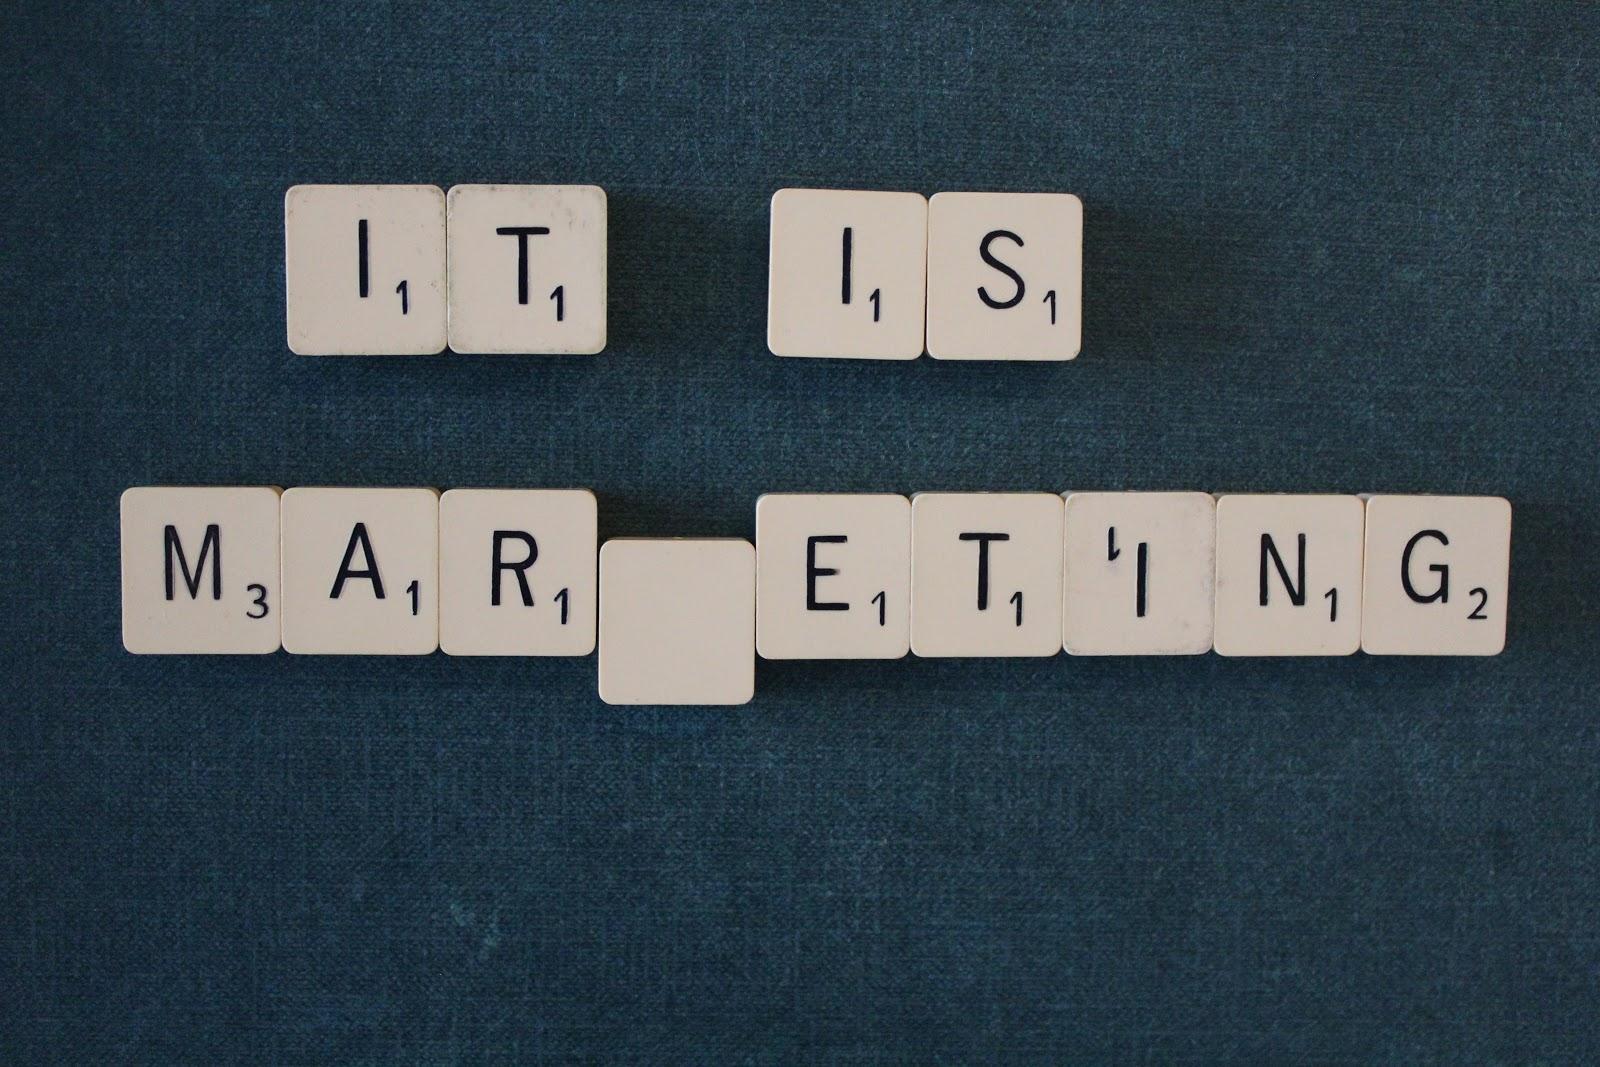 marketing scrabble